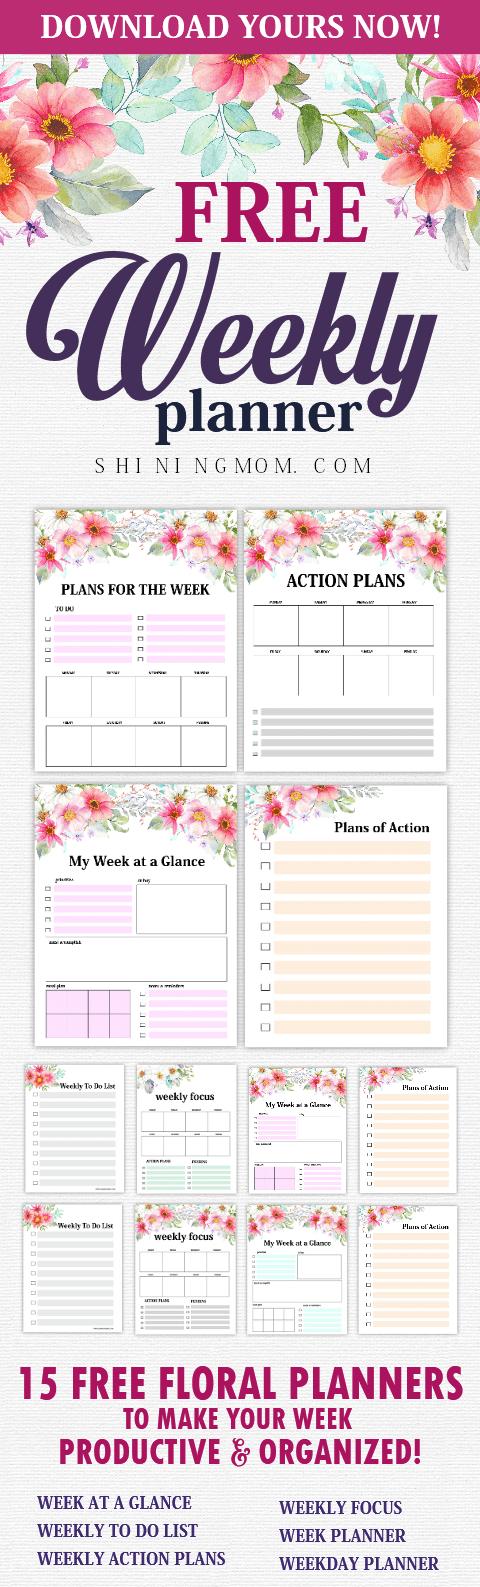 Free Weekly Planner Templates  Beautiful Designs  Weekly